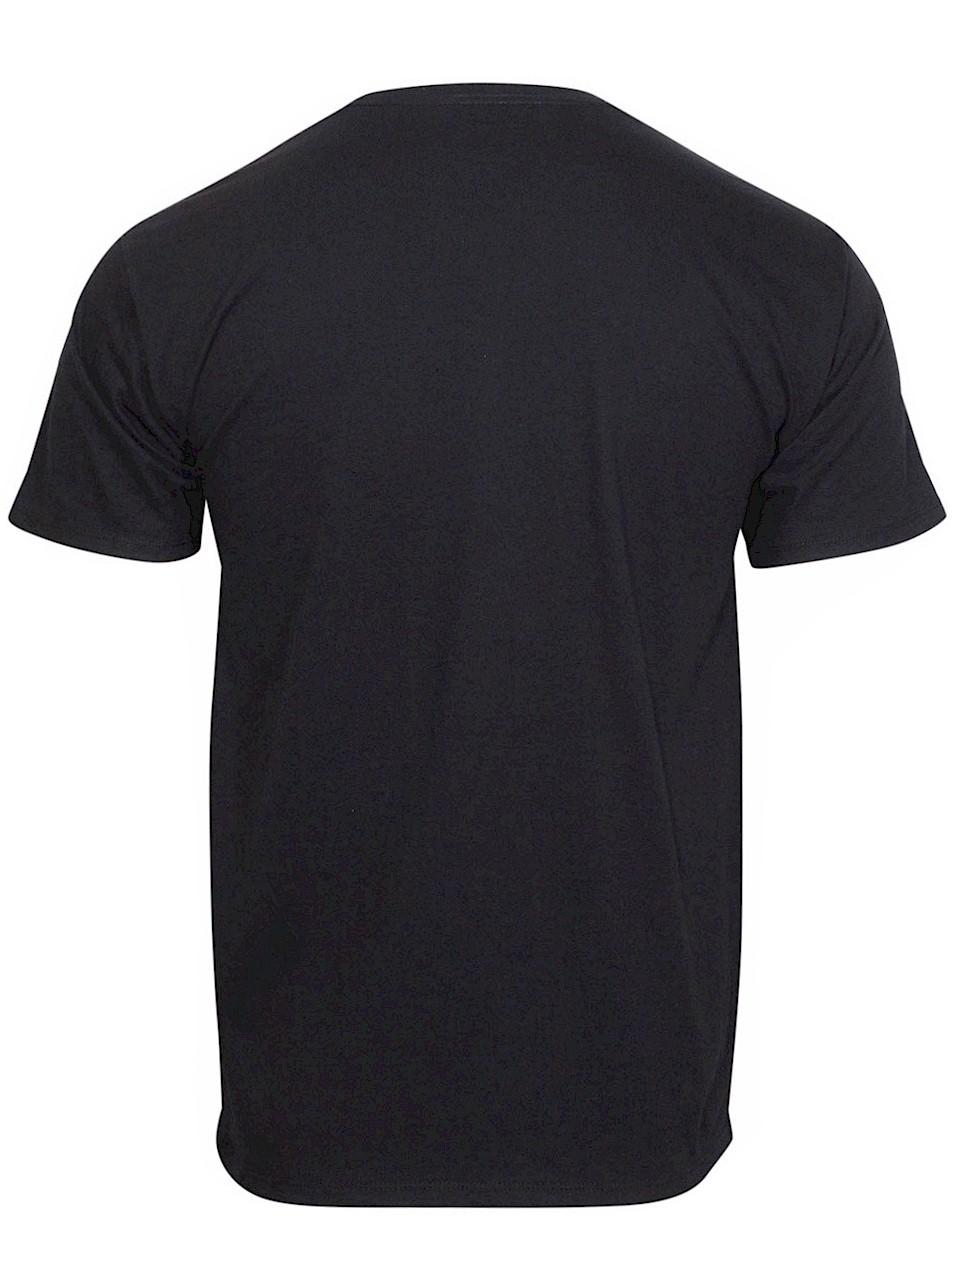 Champion-Split-Script-Logo-Jersey-T-Shirt-Men-039-s-Short-Sleeve-Crew-Neck-Cotton thumbnail 4